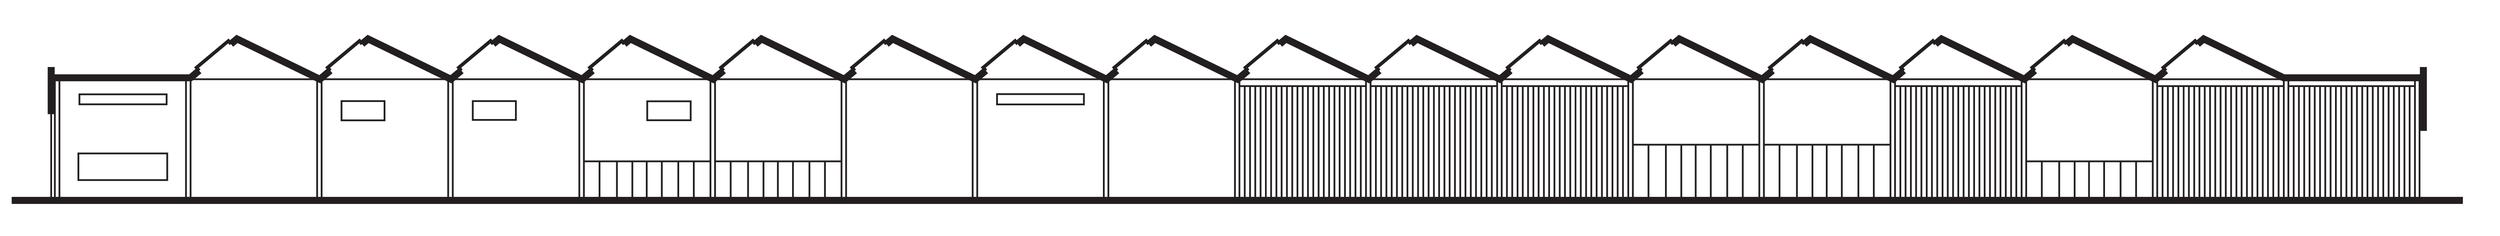 Vitsœ Headquarters, longitudinal section, architect Martin Francis, 2017